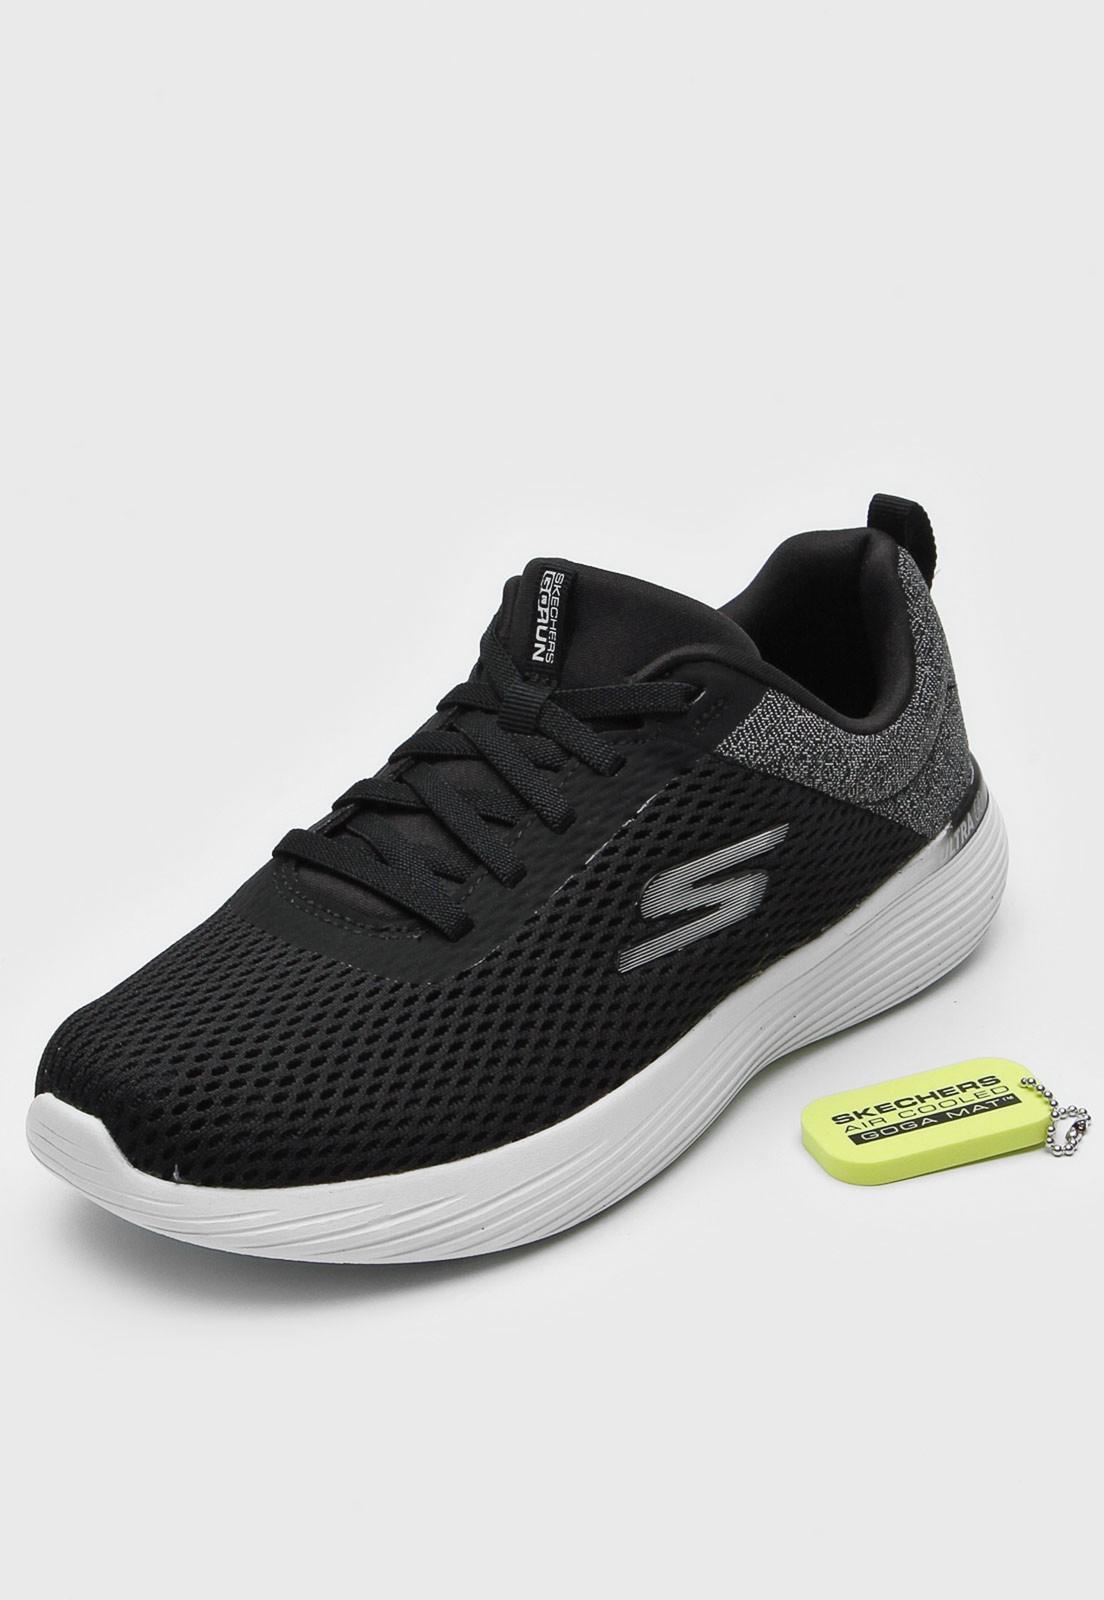 Tênis Go Run 400 V2 - Scion Feminino Skechers